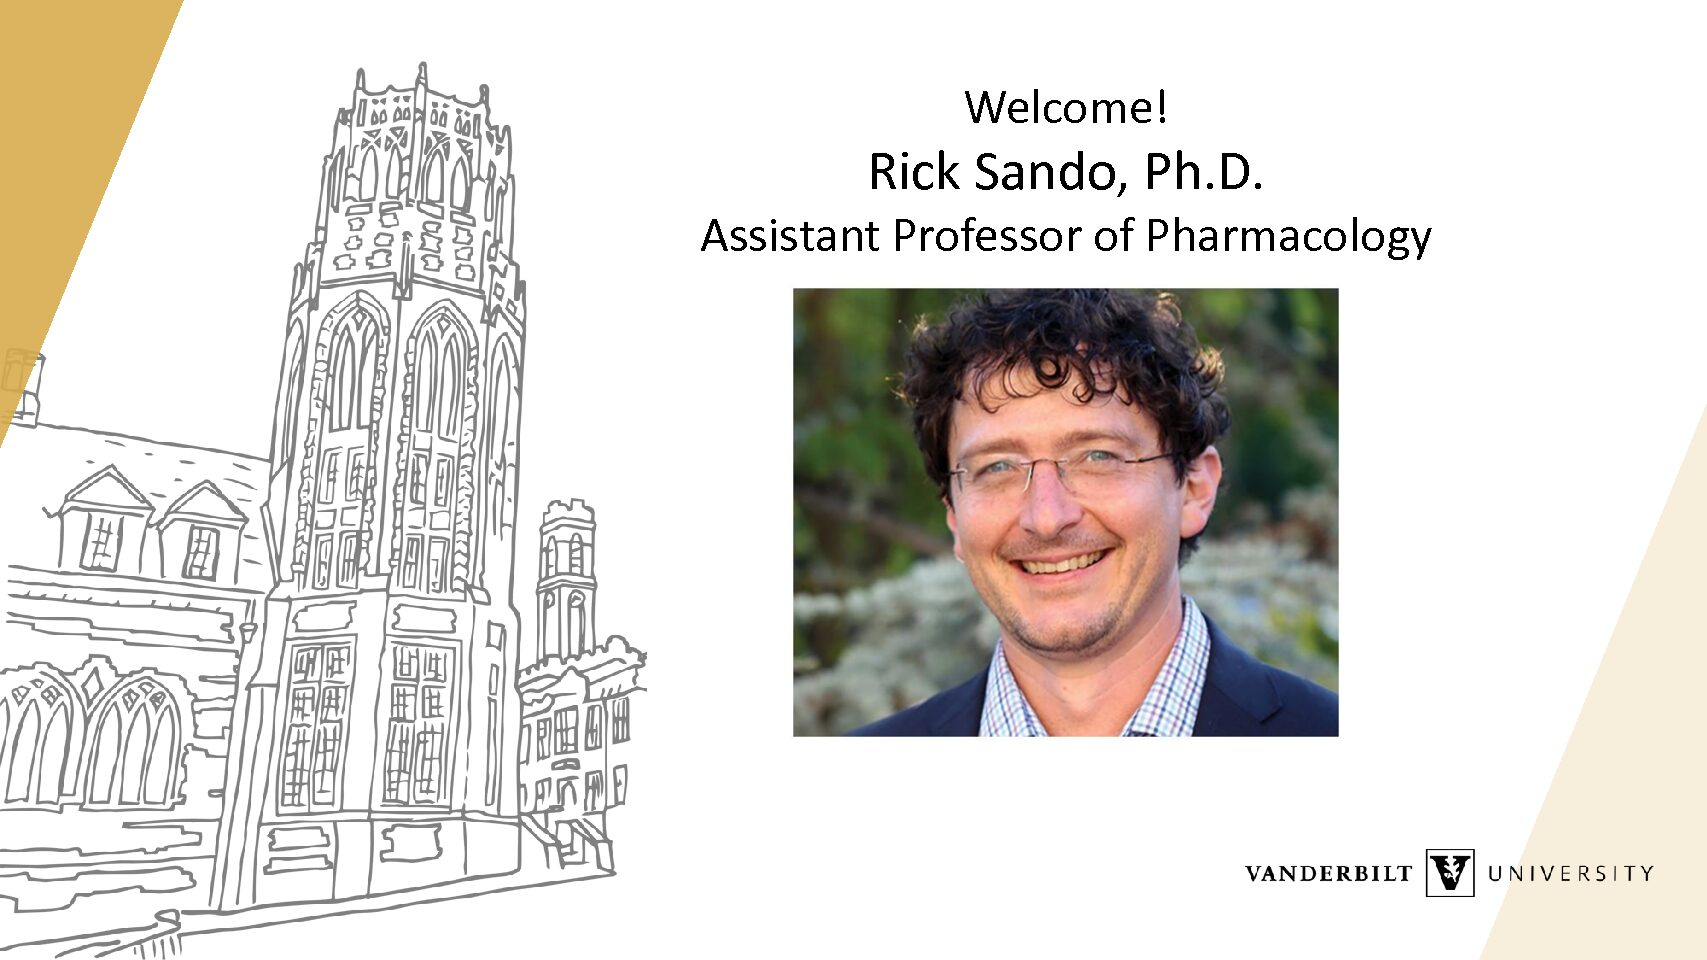 Welcome Rick Sando